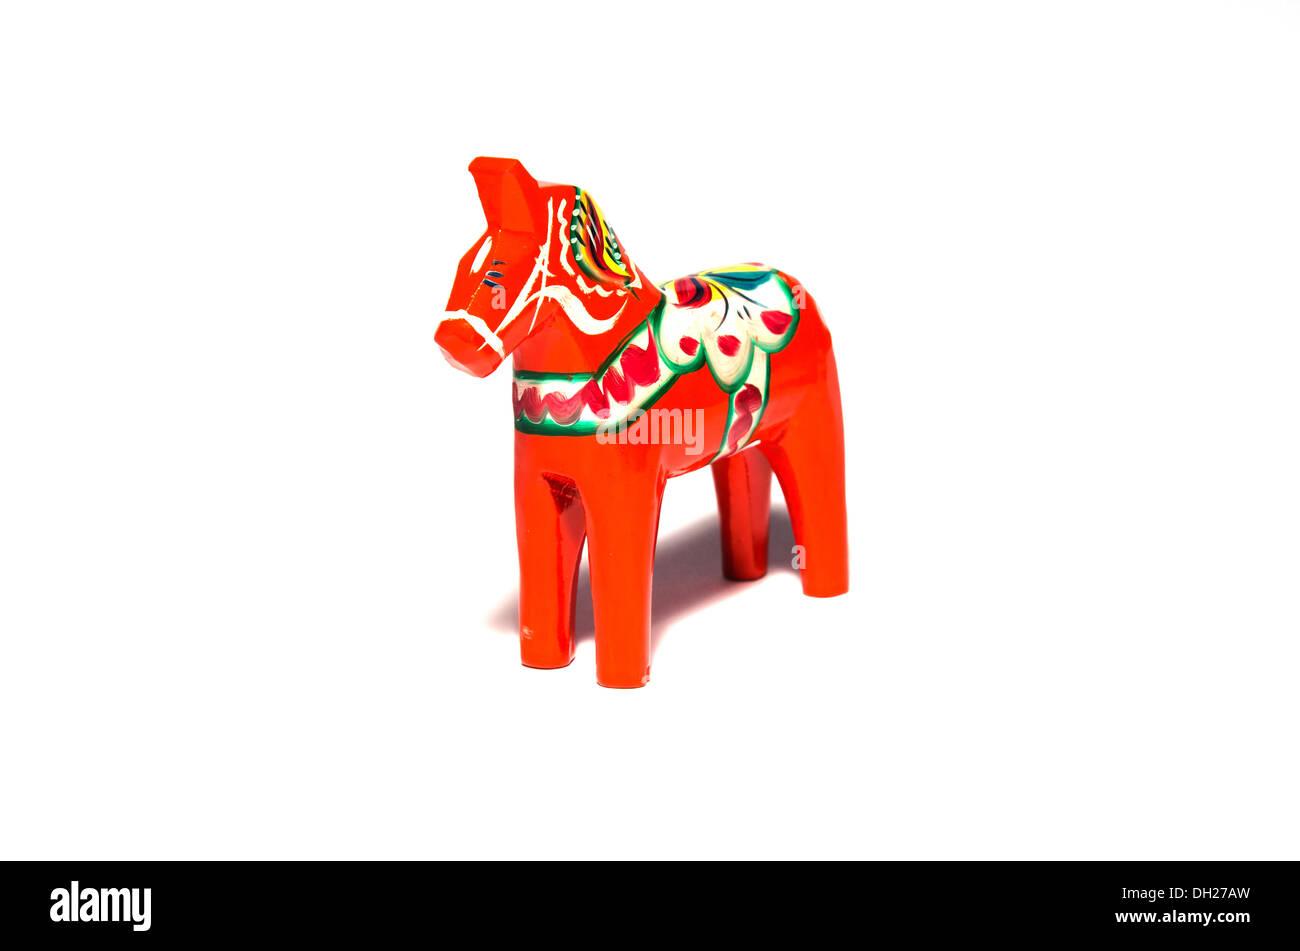 Dala horse, a swedish symbol carved of wood. - Stock Image